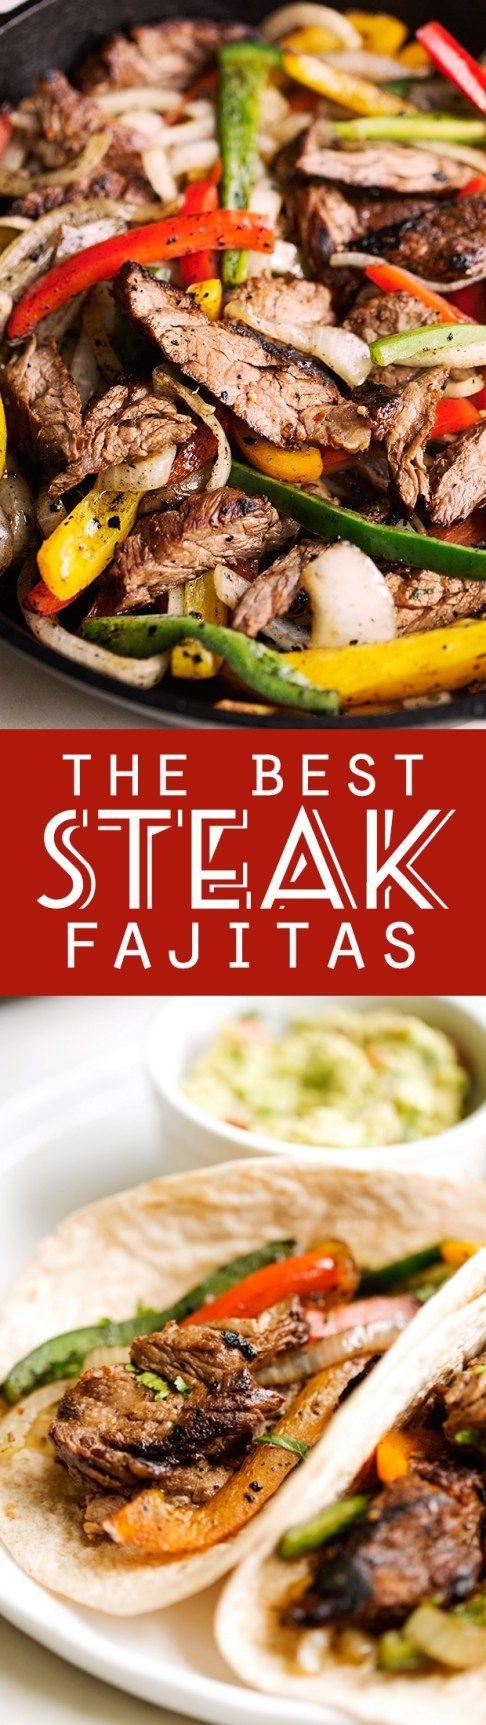 The BEST Steak Fajitas Interesting marinade LJ ~ The BEST Steak Fajitas - made with 1 secret ingredient to make them tender and… #marinadeforskirtsteak